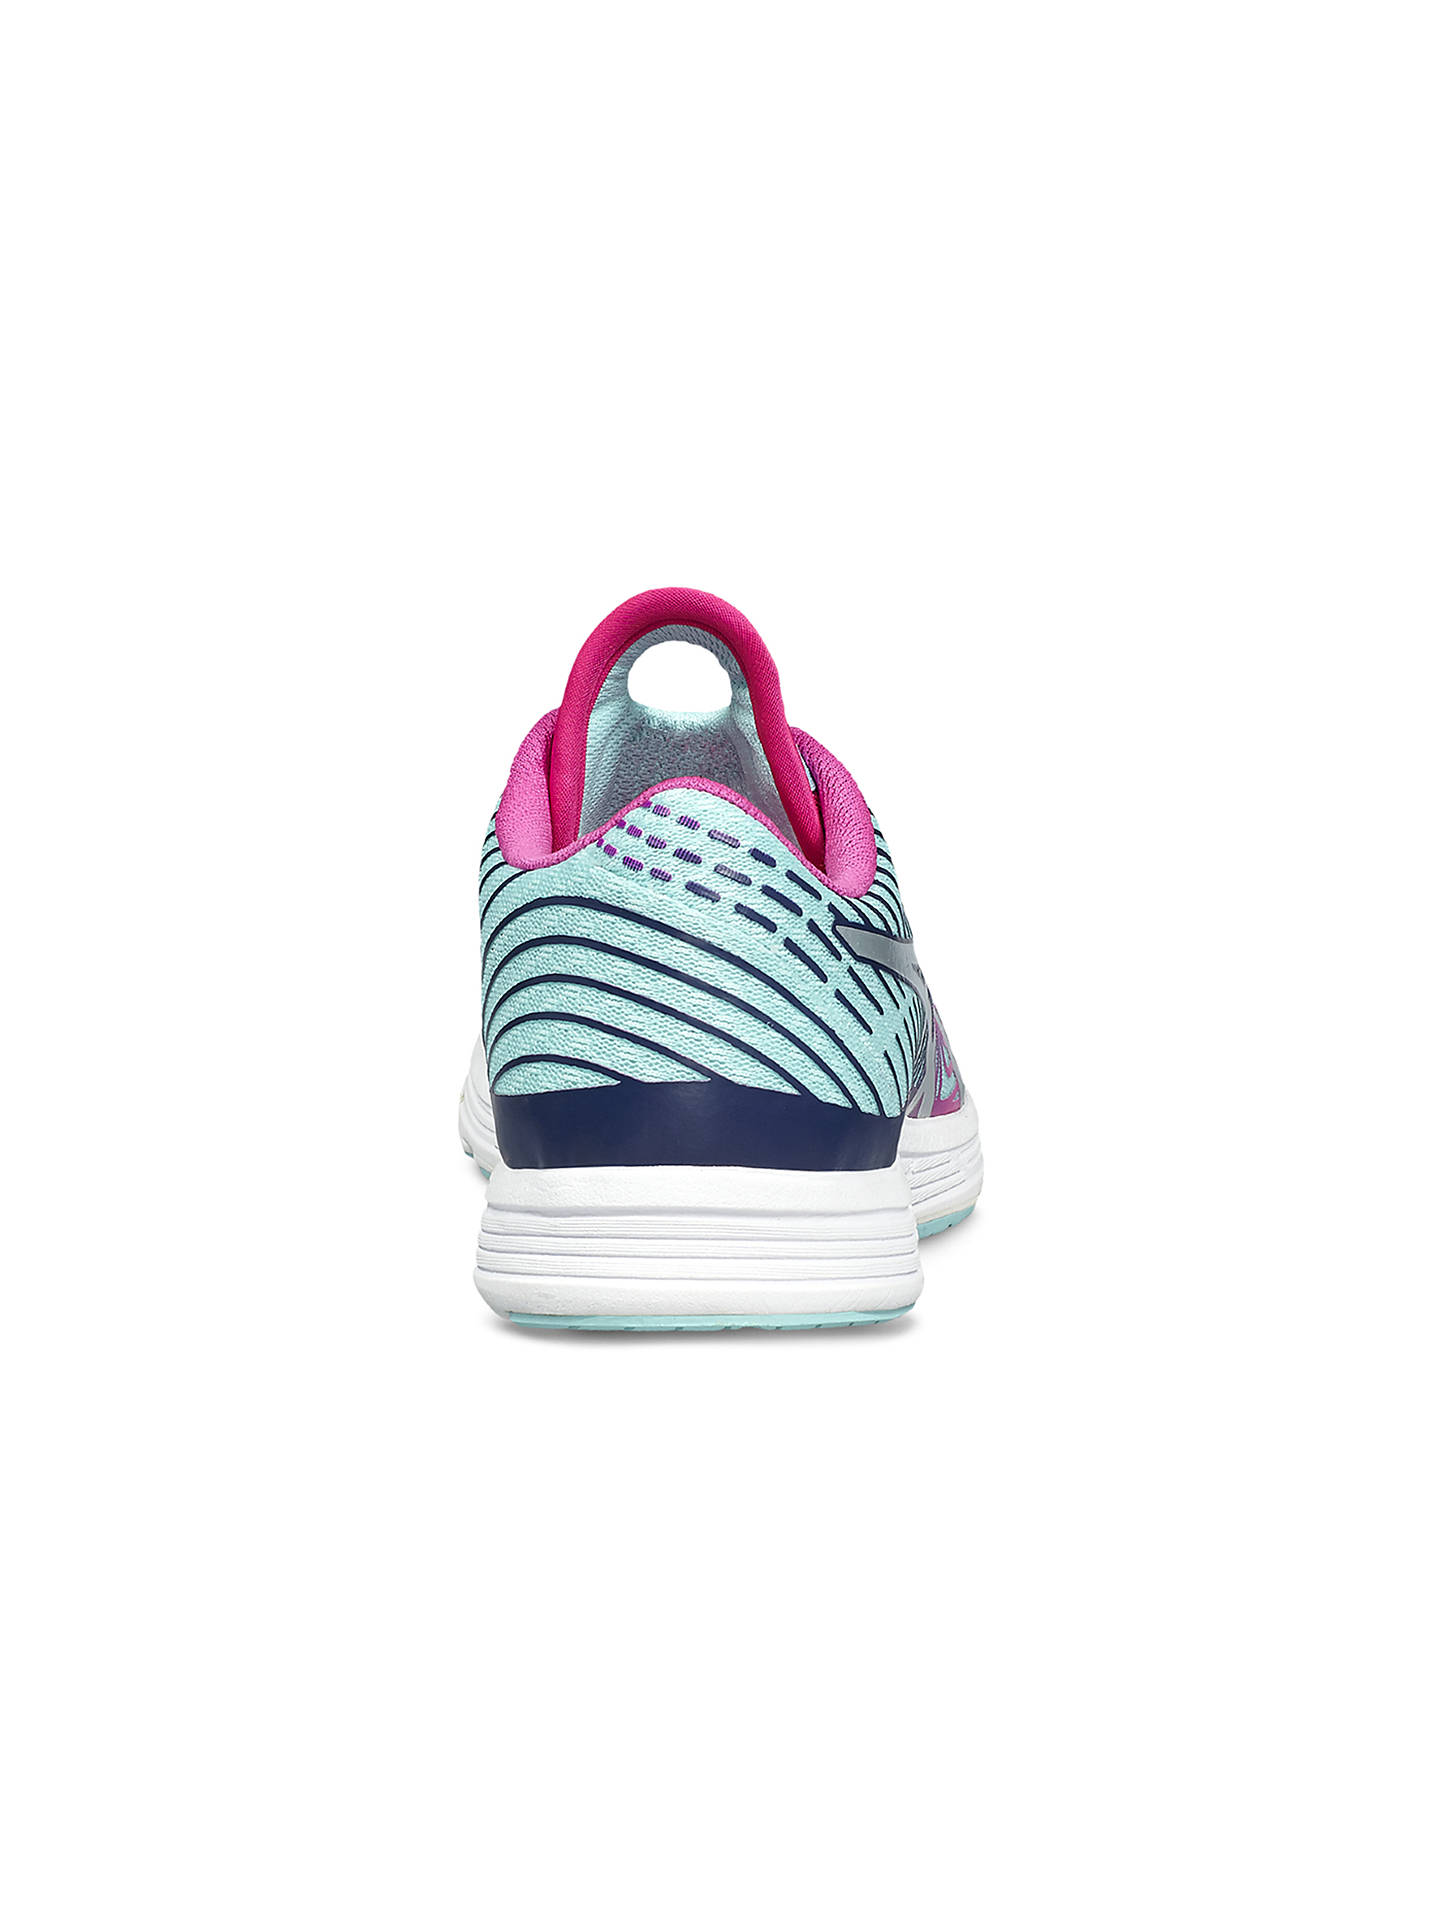 Asics GEL Hyper Tri 3 Women's Running Shoes, Blue at John